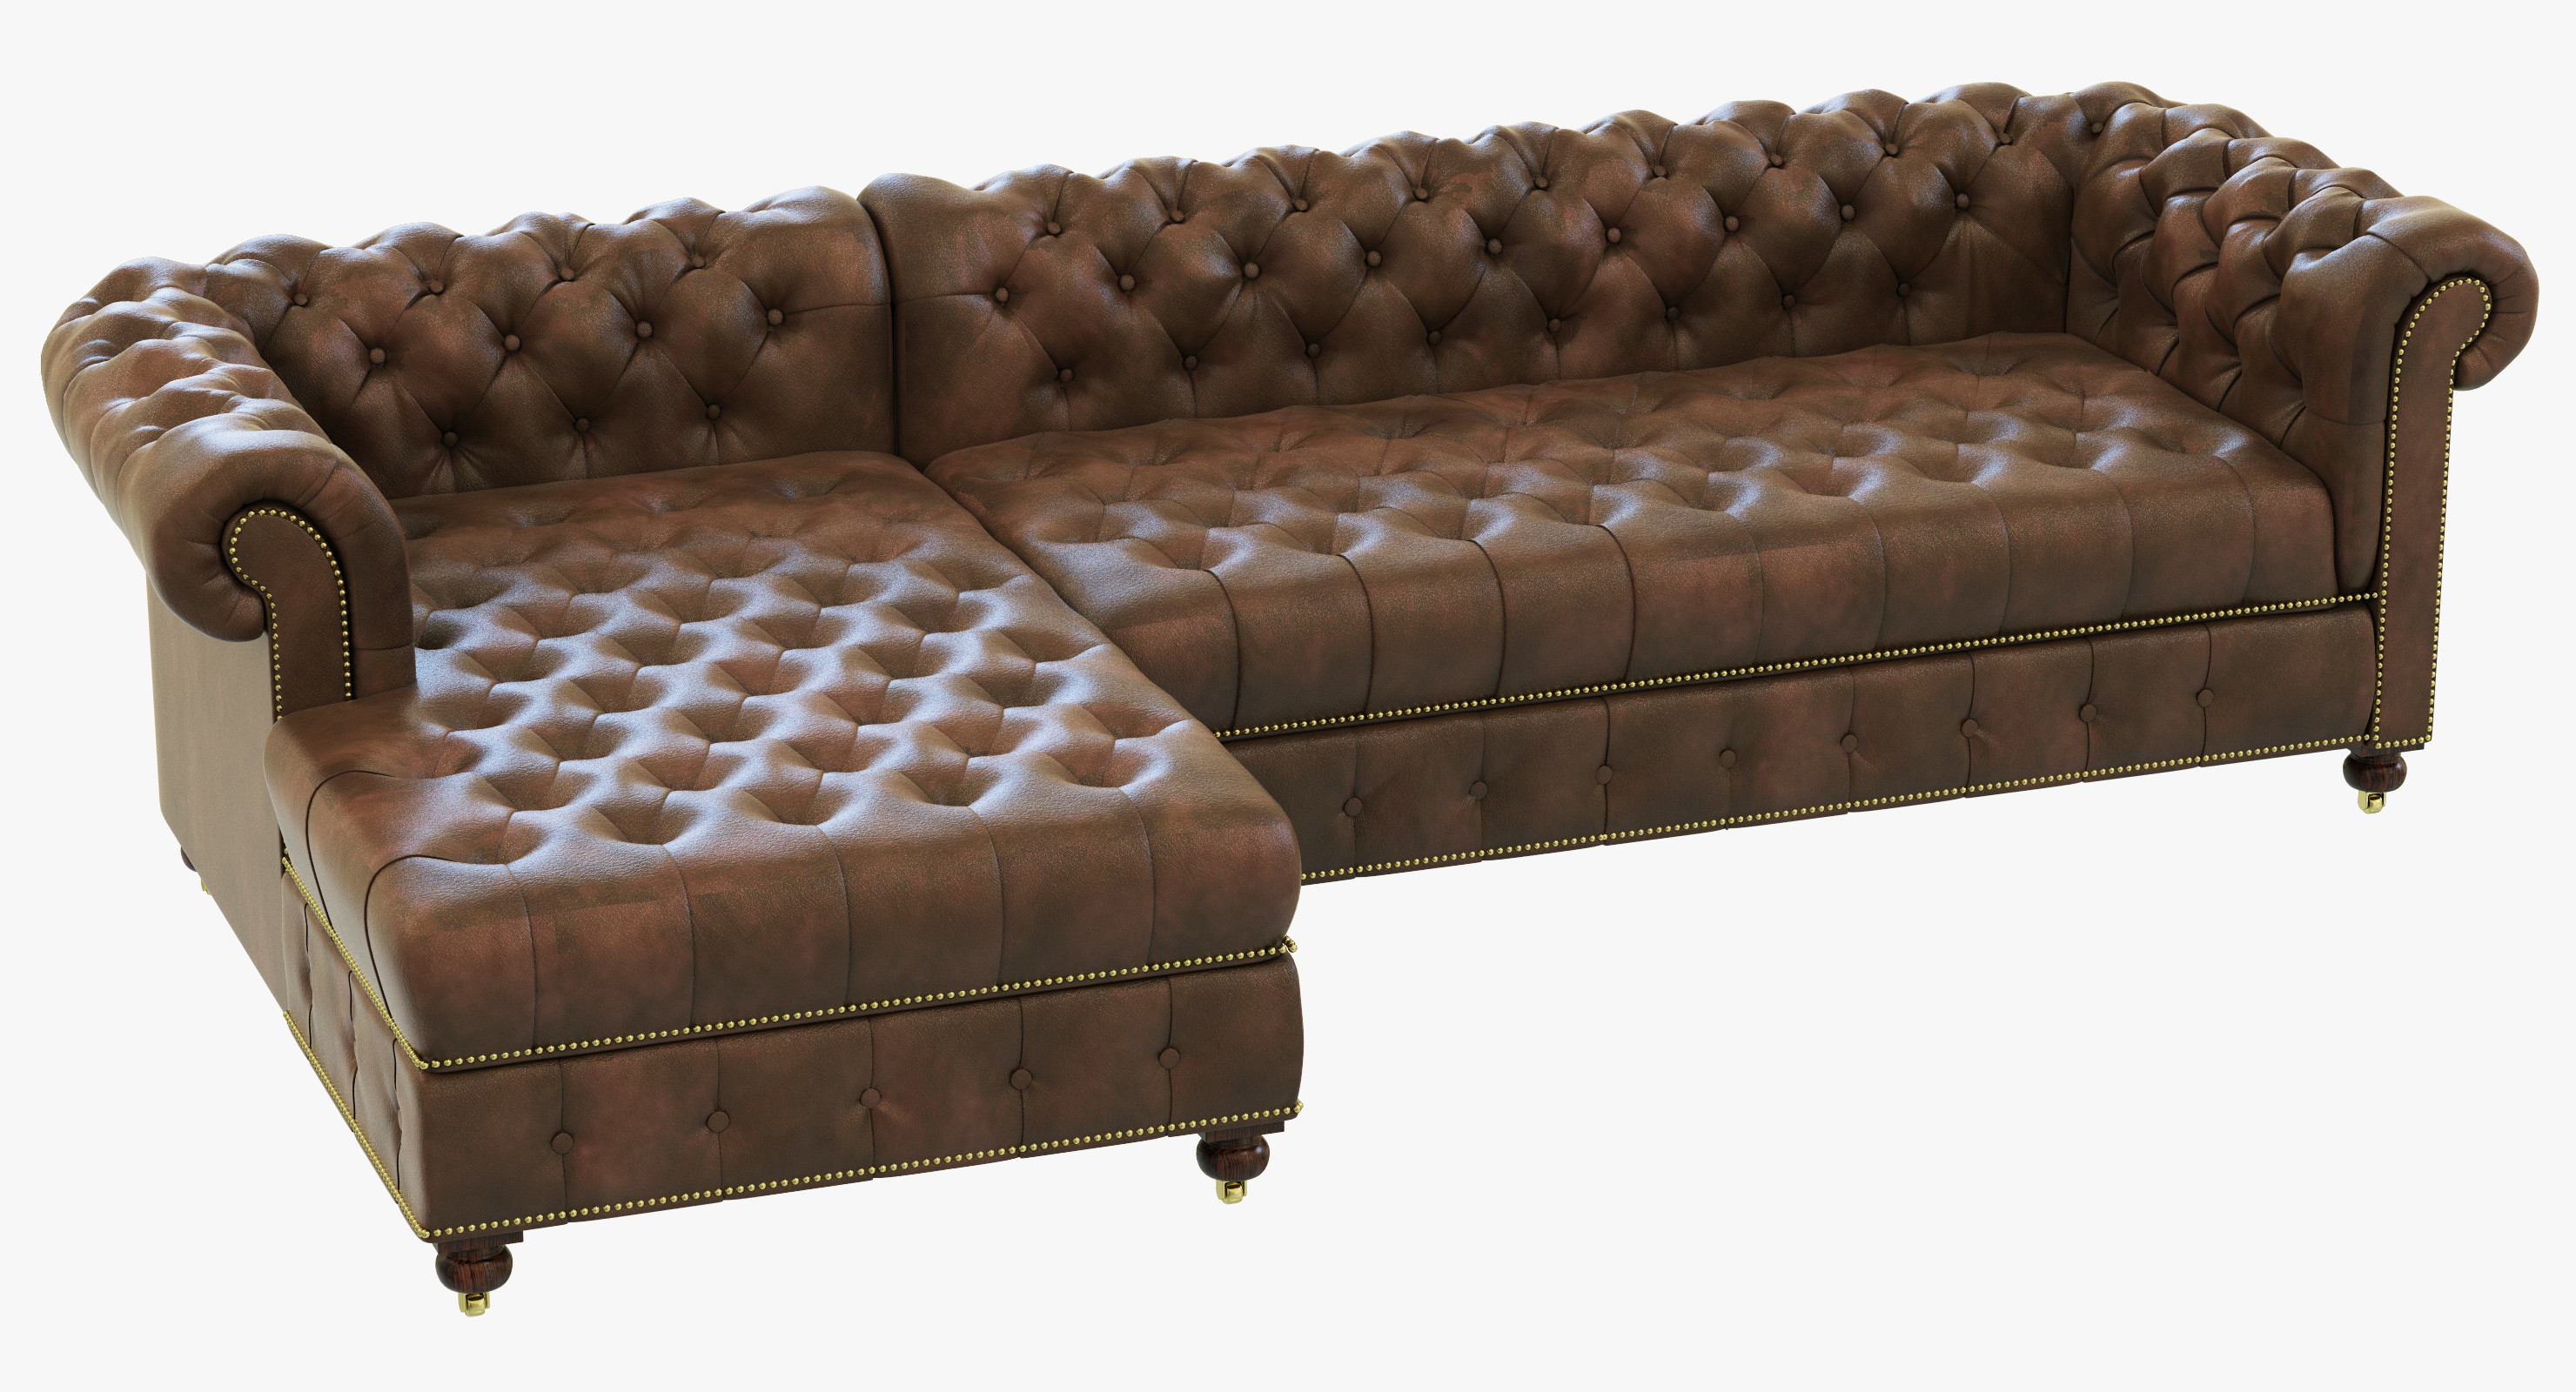 restoration hardware kensington sofa 106 vine london cambridge max